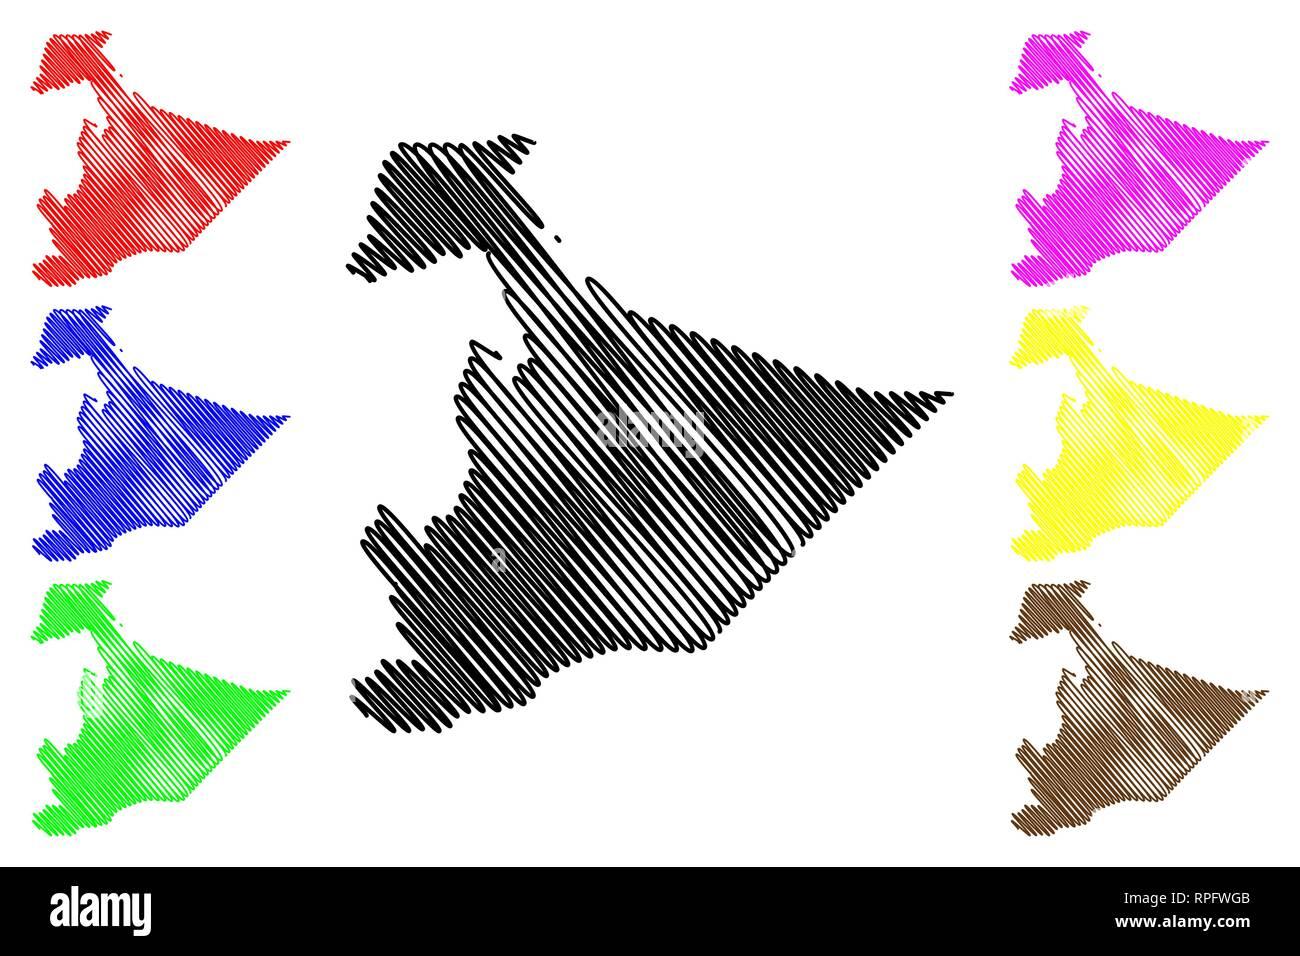 Somali Region (Federal Democratic Republic of Ethiopia, Horn